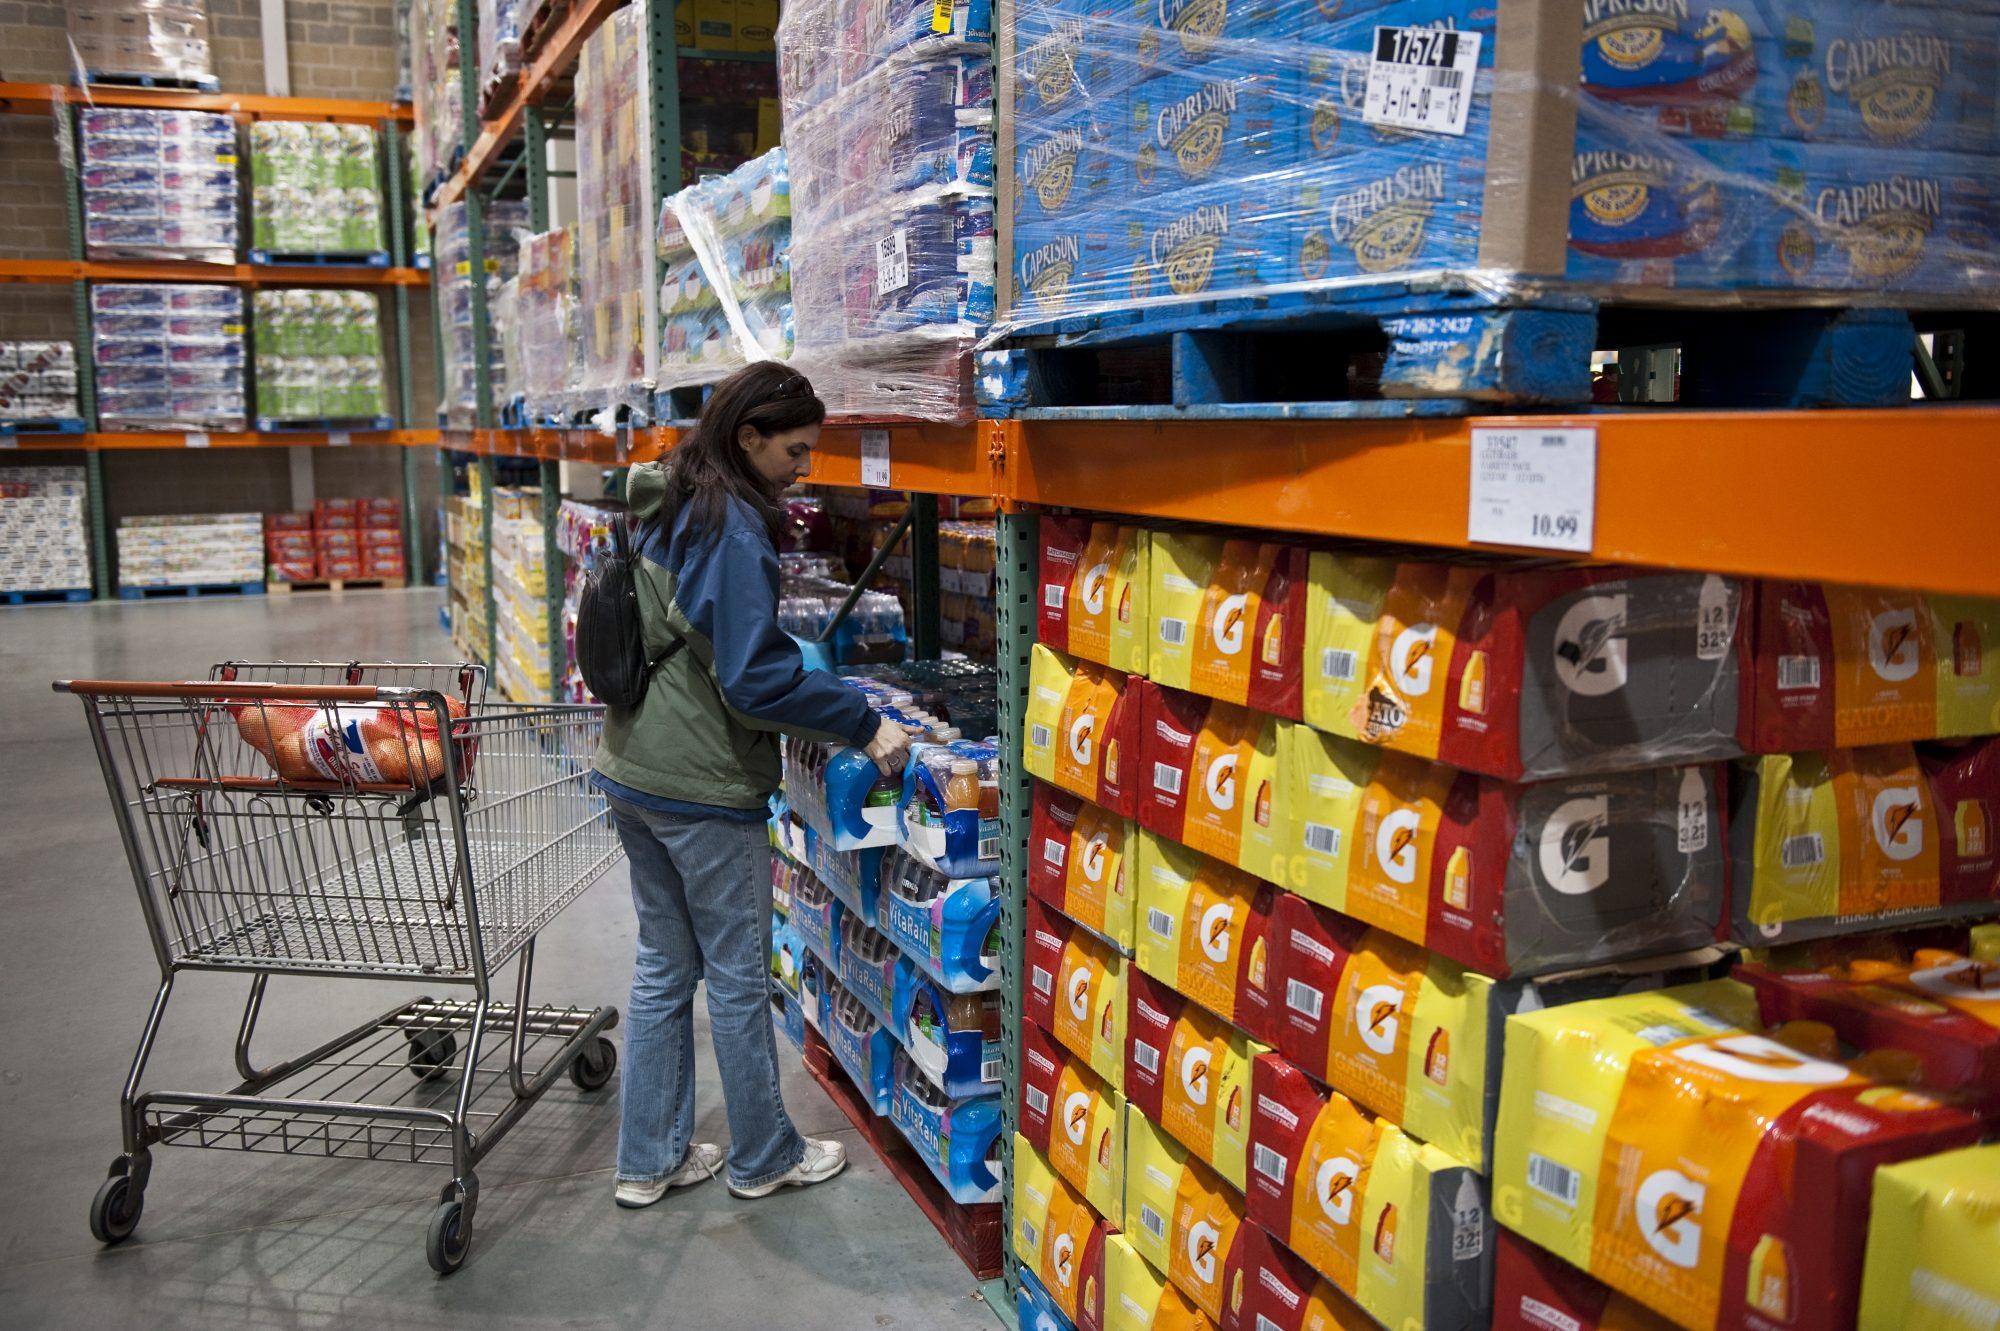 getty costco drinks image